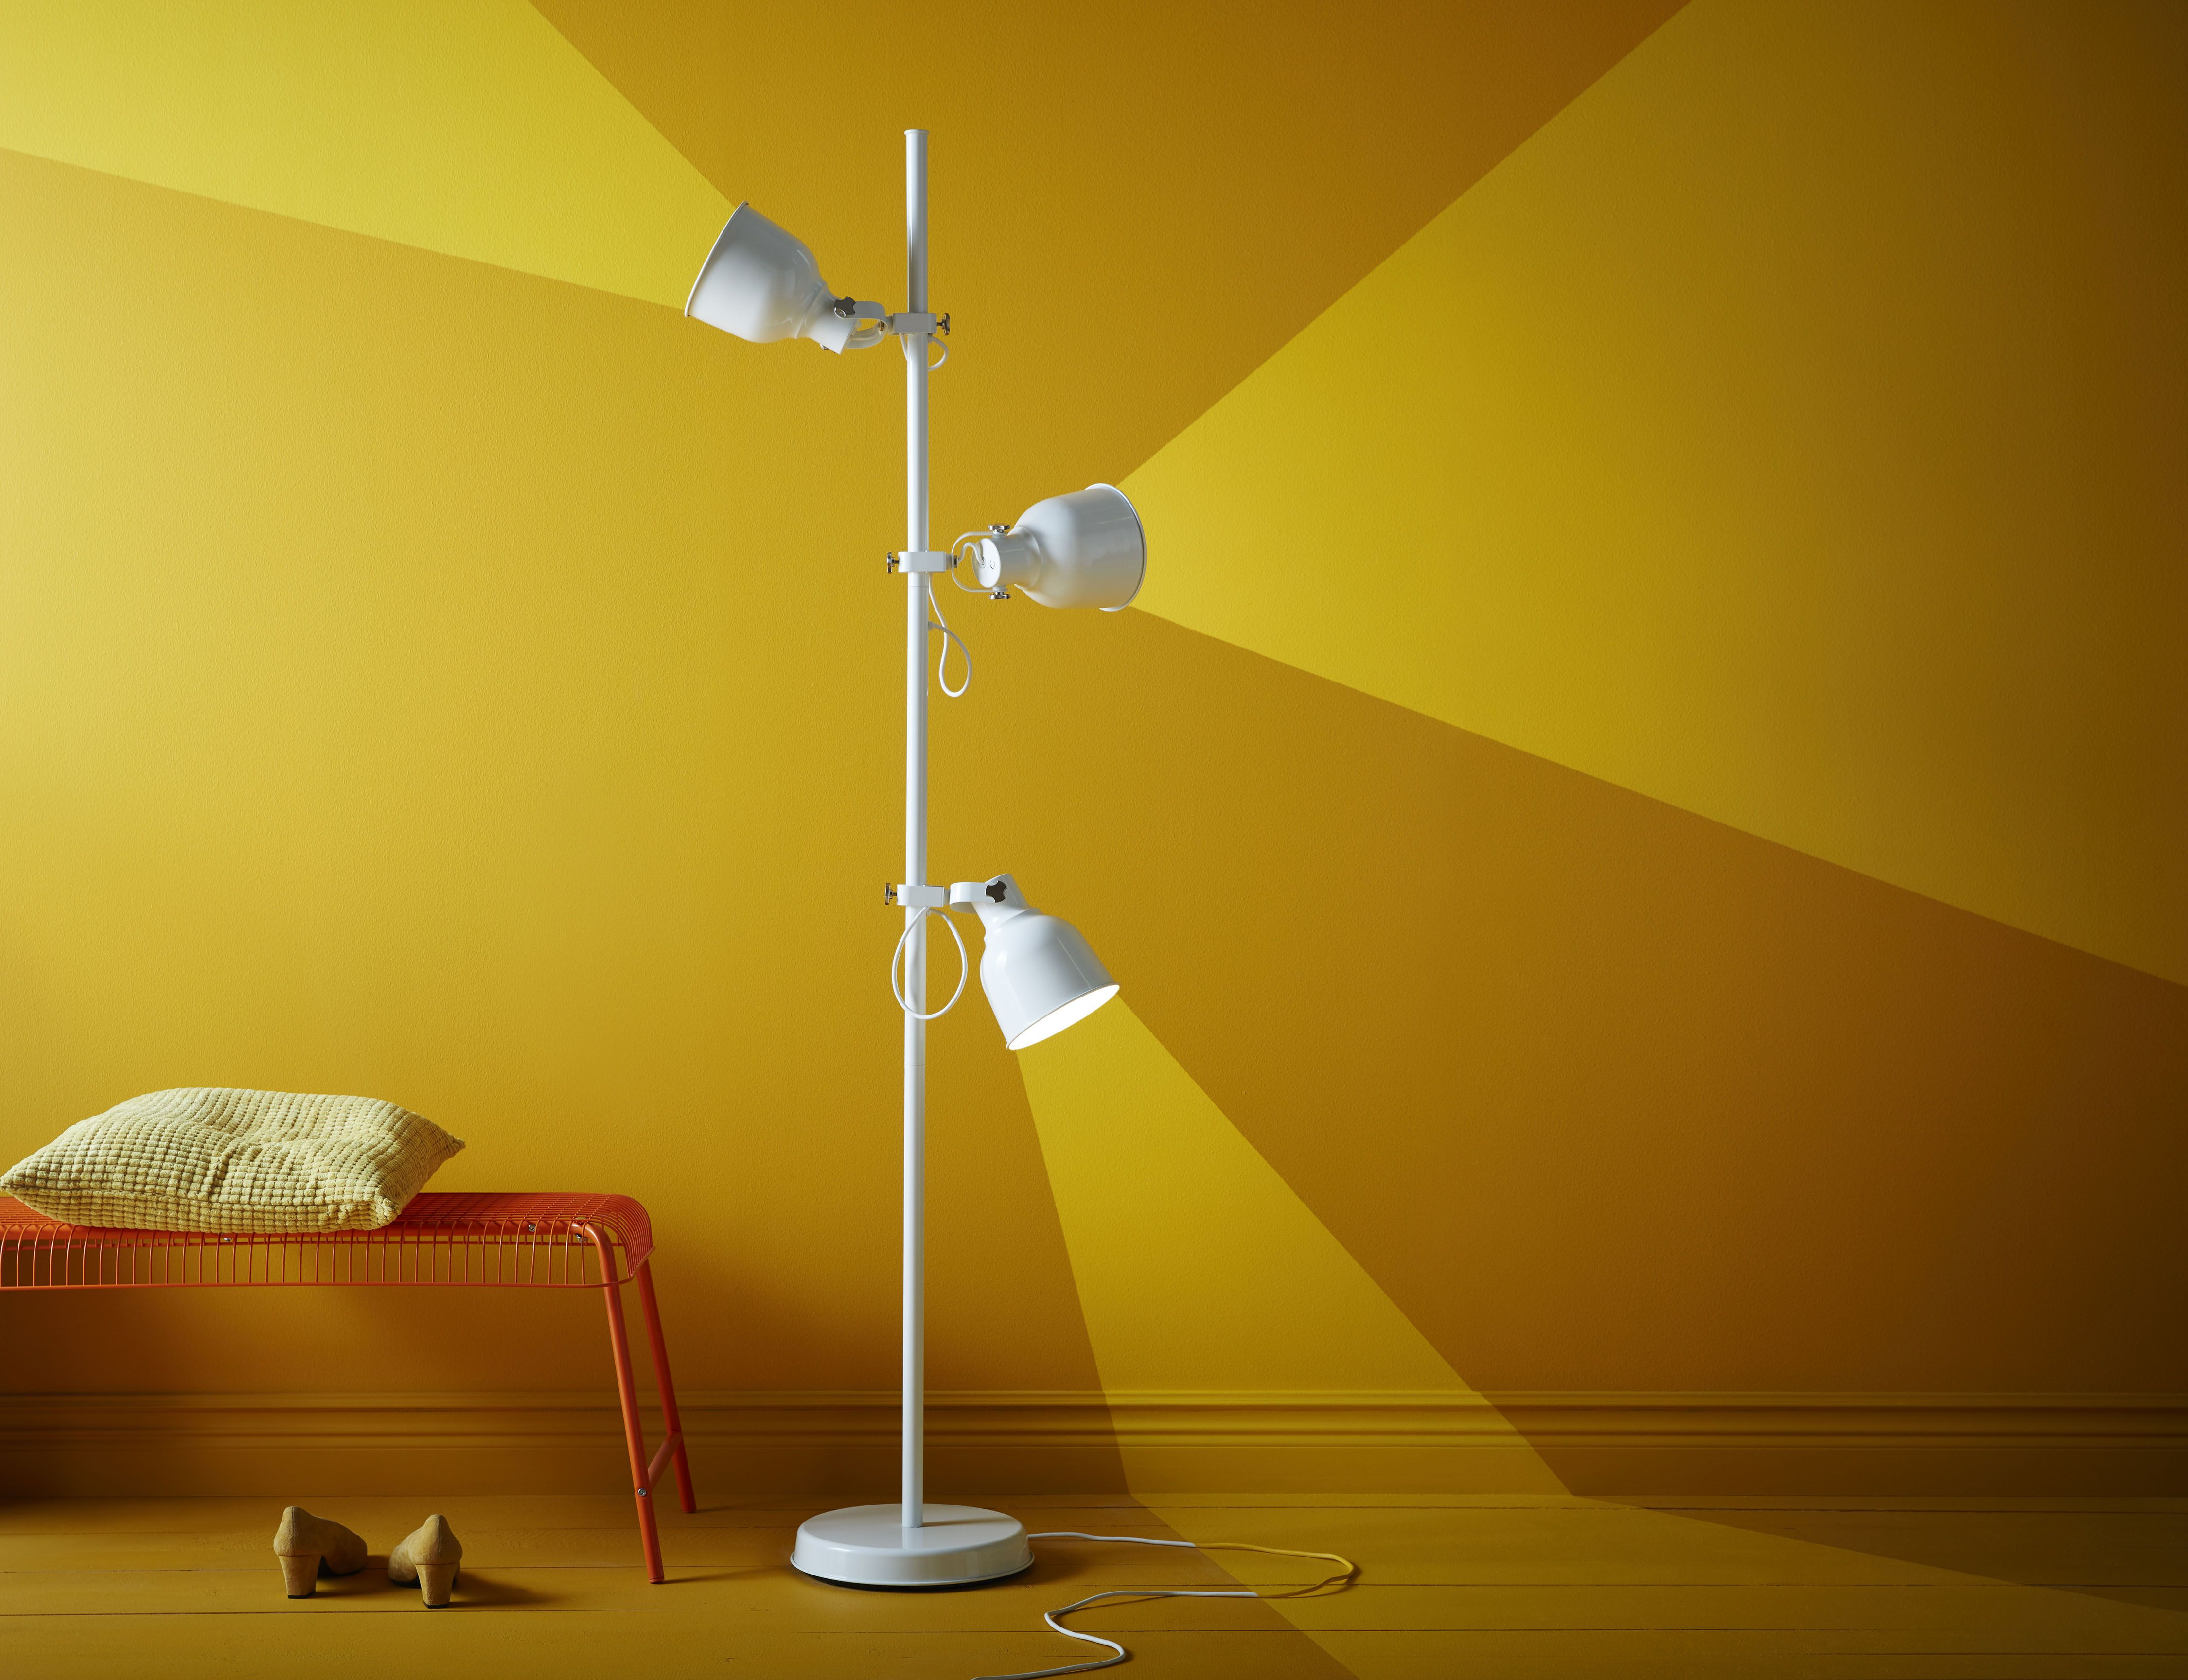 Ikea led verlichting keuken sfw beautiful dressoir ikea geheel